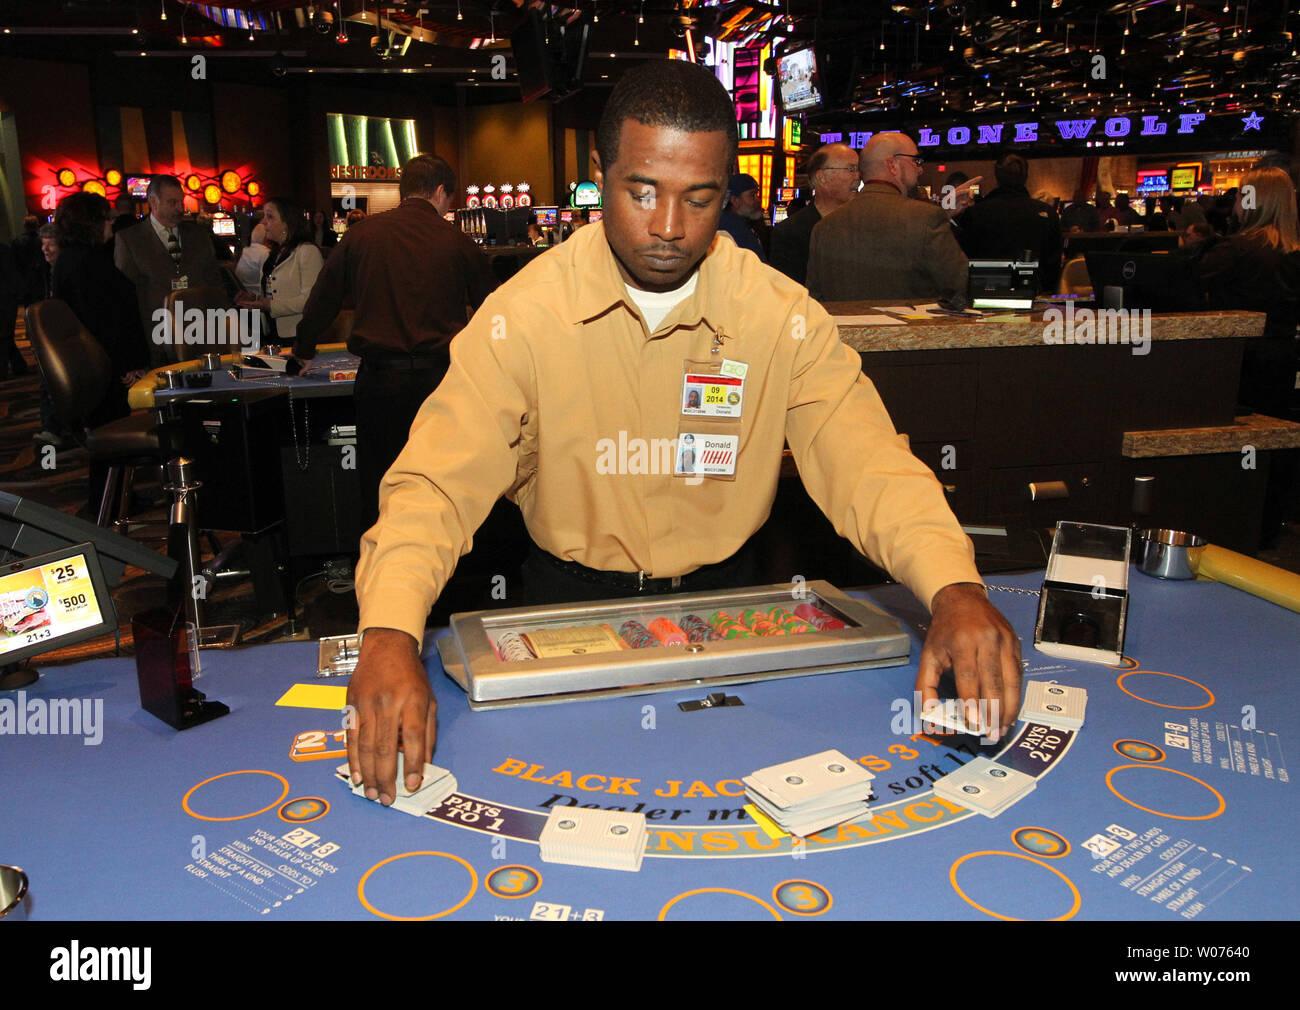 Jack black casino dealer photo indio casino complaints